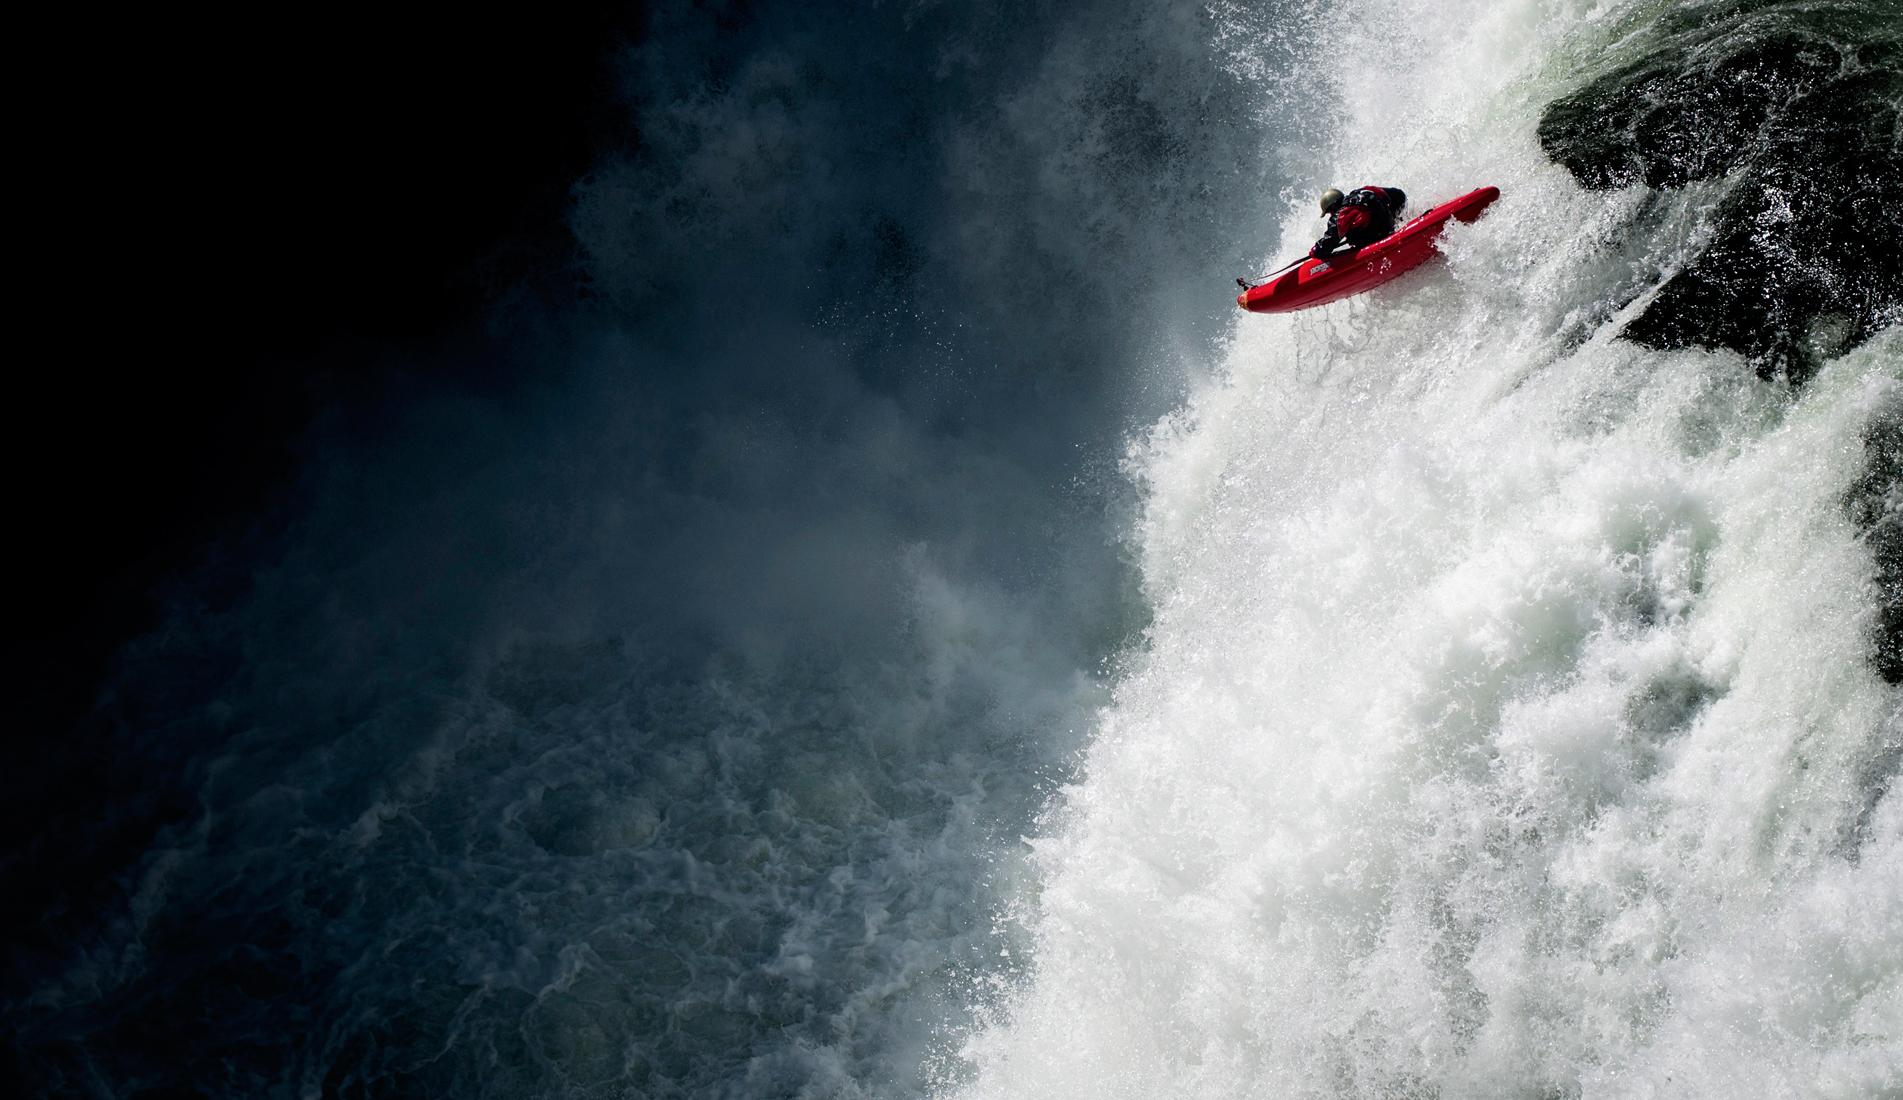 fotos-adrenalina-watersports-12